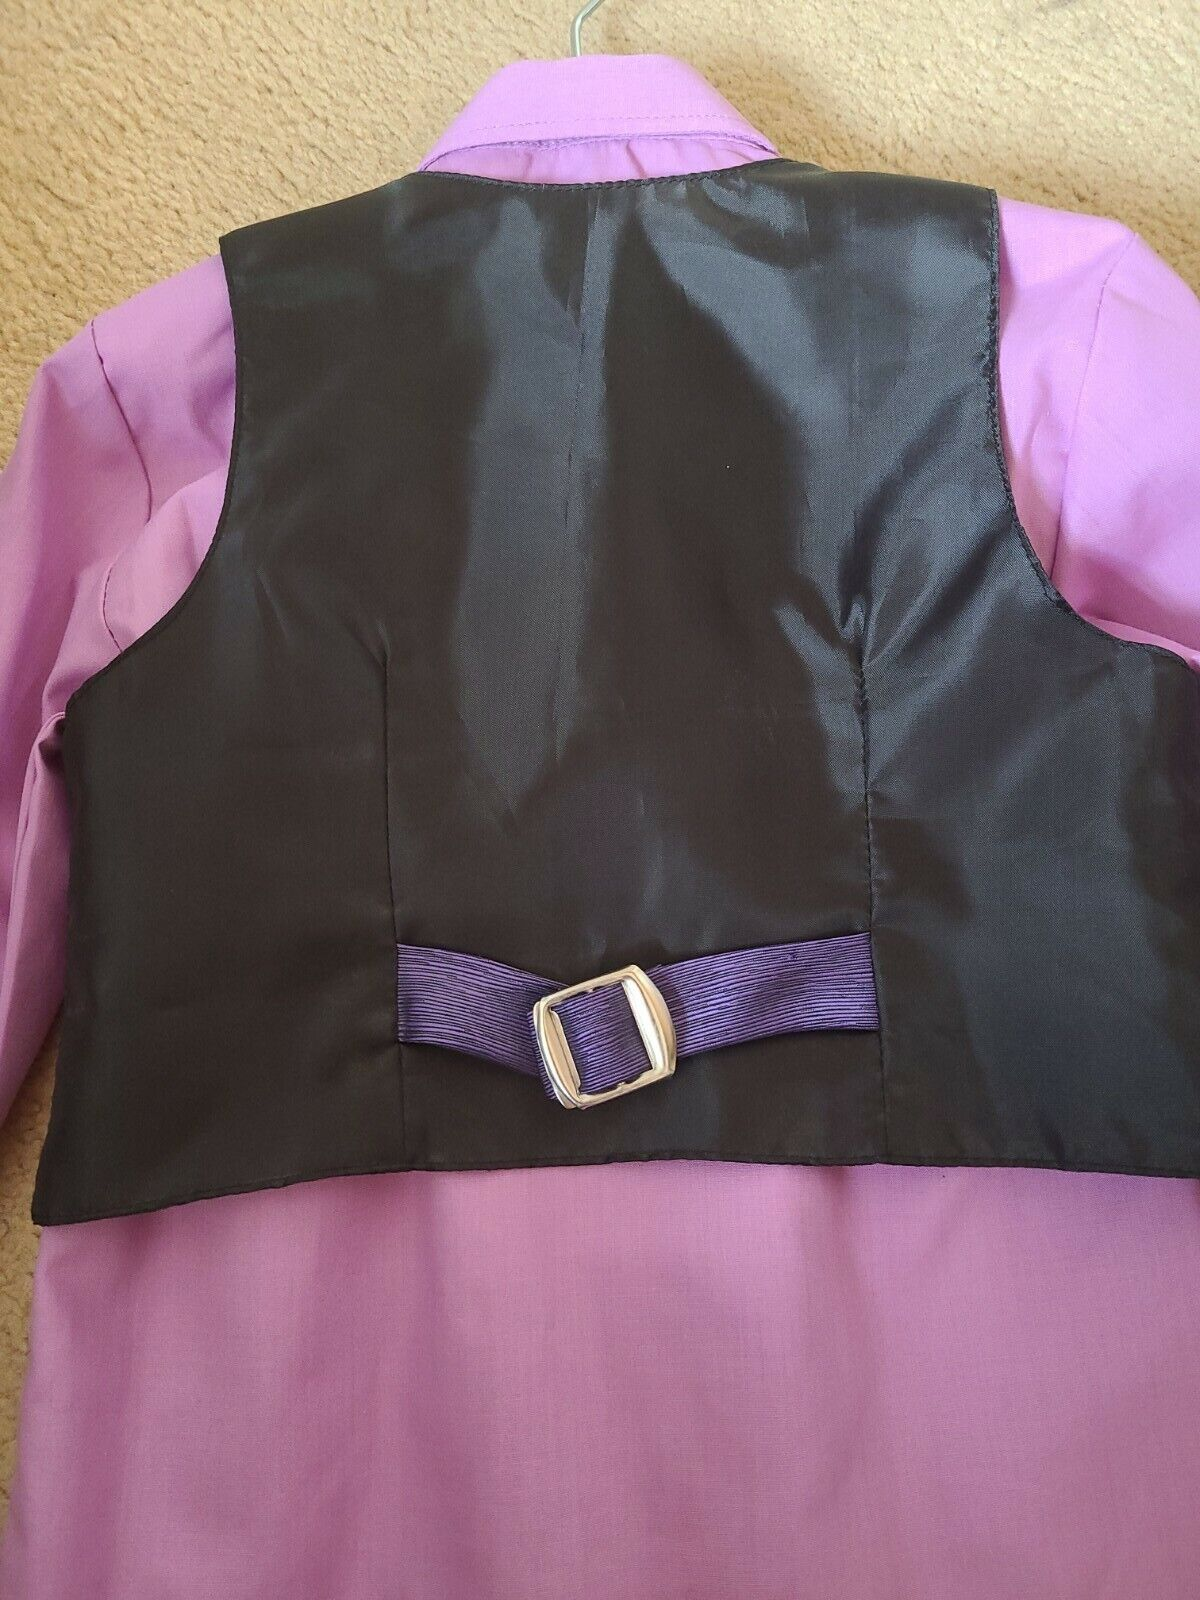 Boys Suit Shirt Waistcoat Trousers age 2-3 Hardly Worn